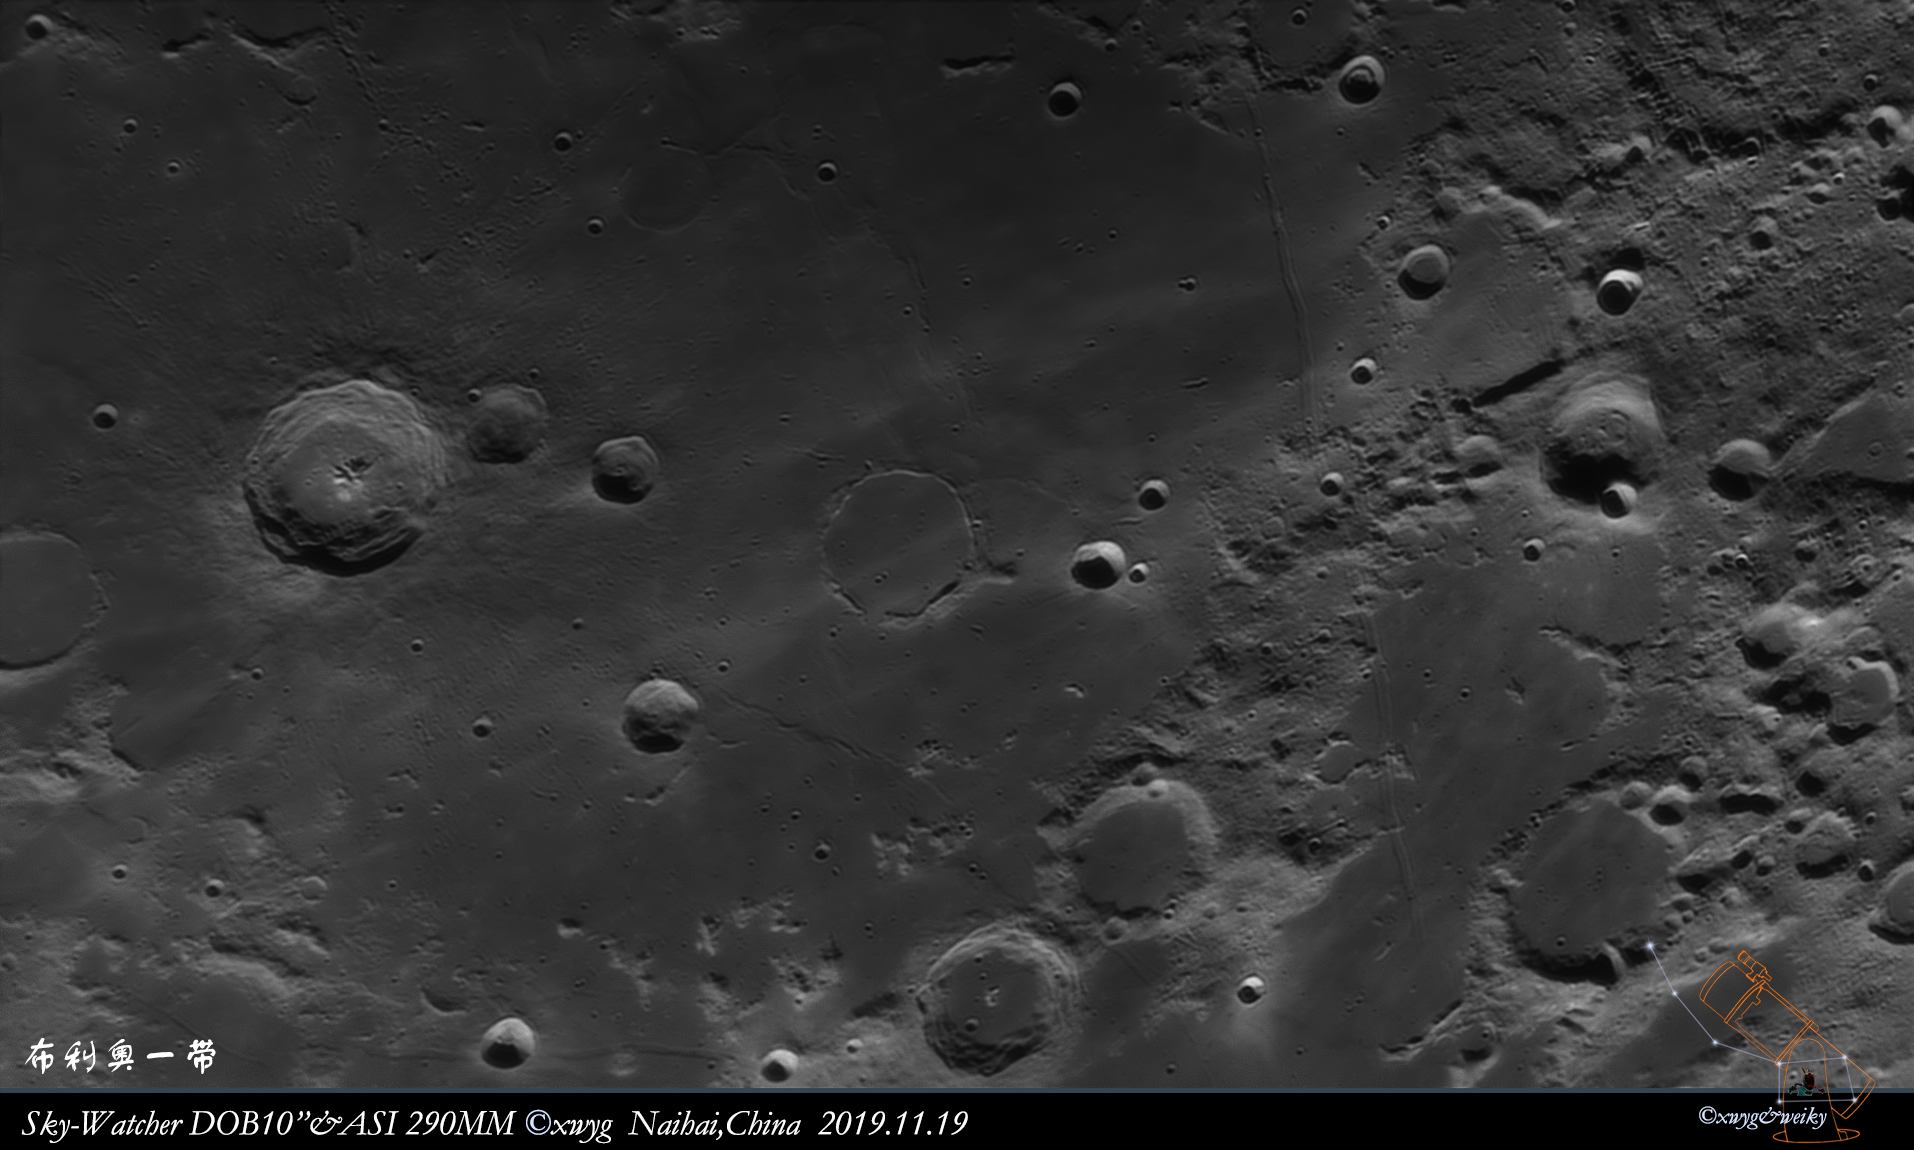 Capture 2019-11-20T05_57_10_lapl4_ap2409.jpg